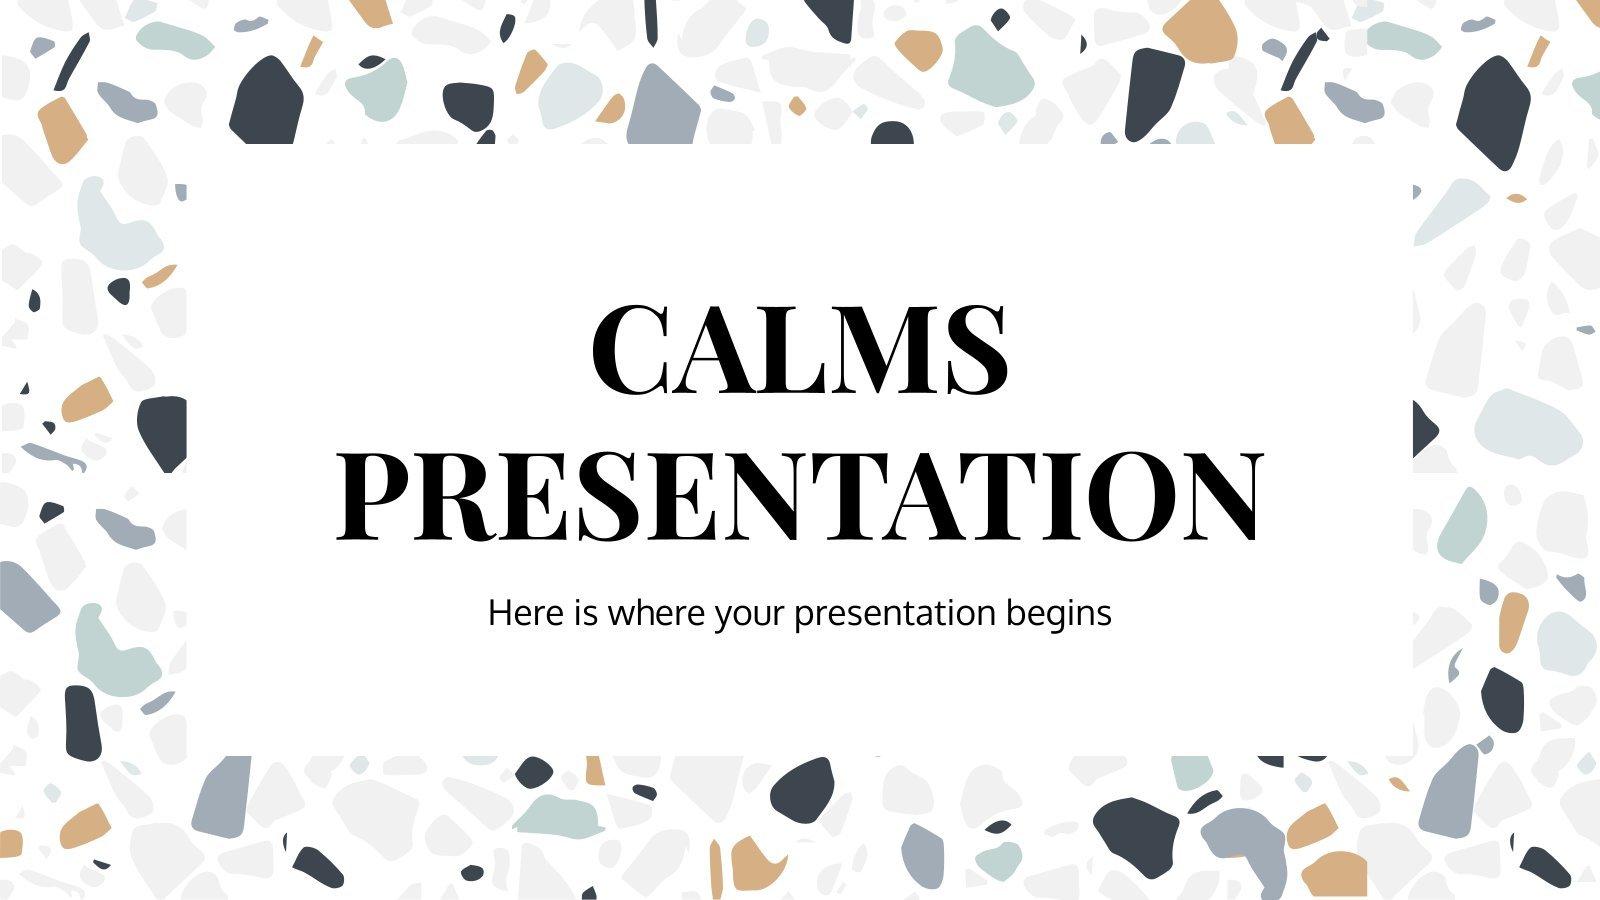 Calms presentation template